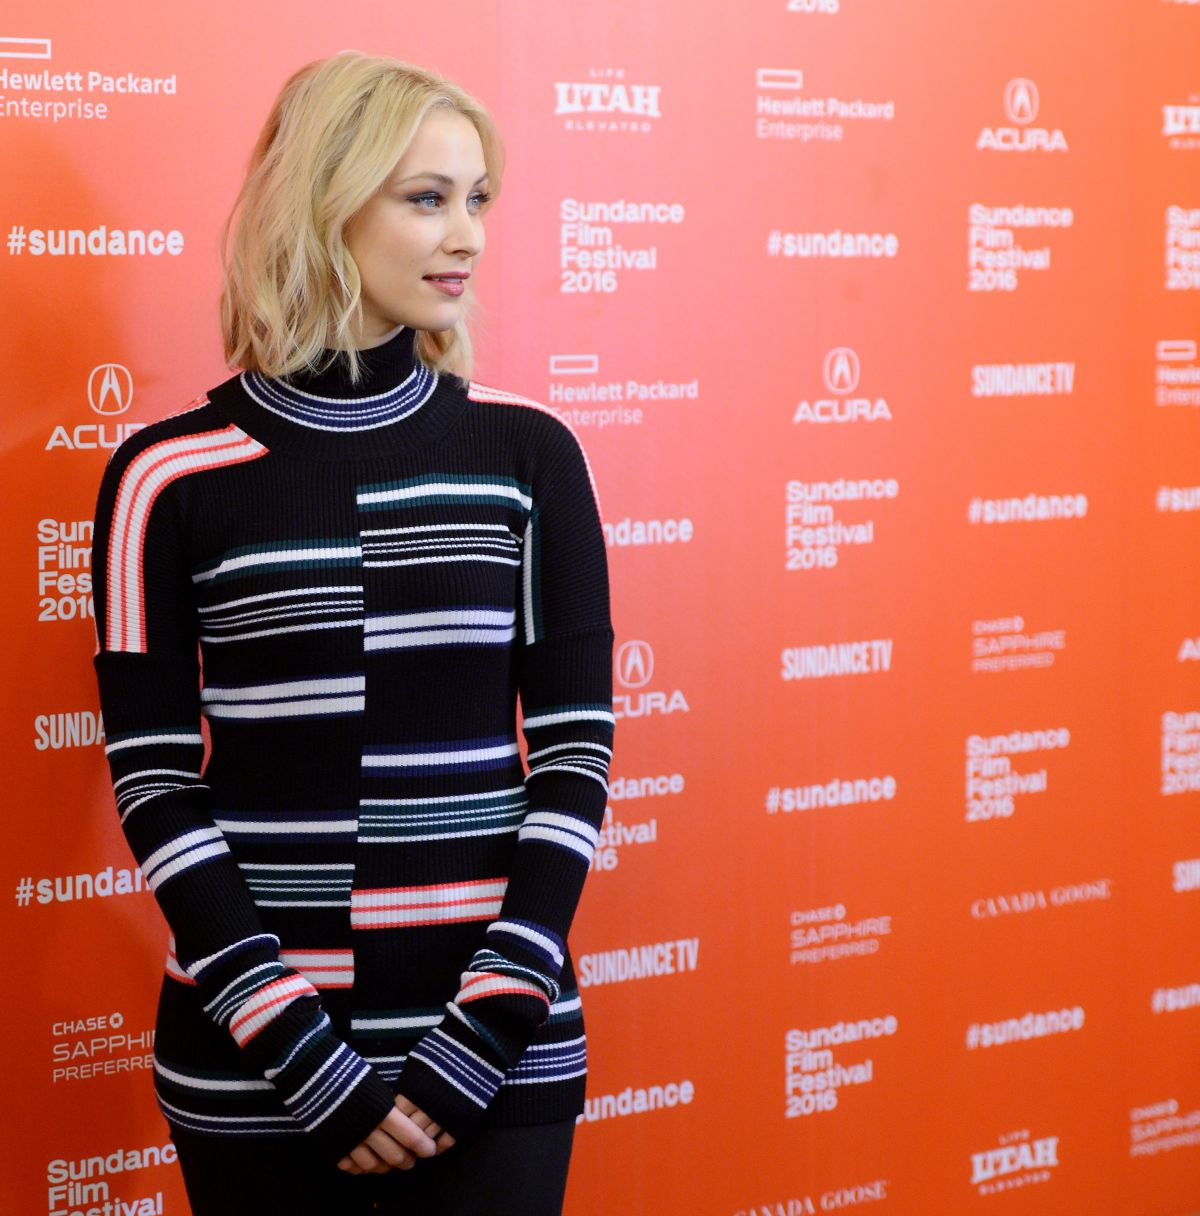 2016 Sundance Film Festival - Sarah Gadon at 1.22.63 Premiere in Park City, Utah